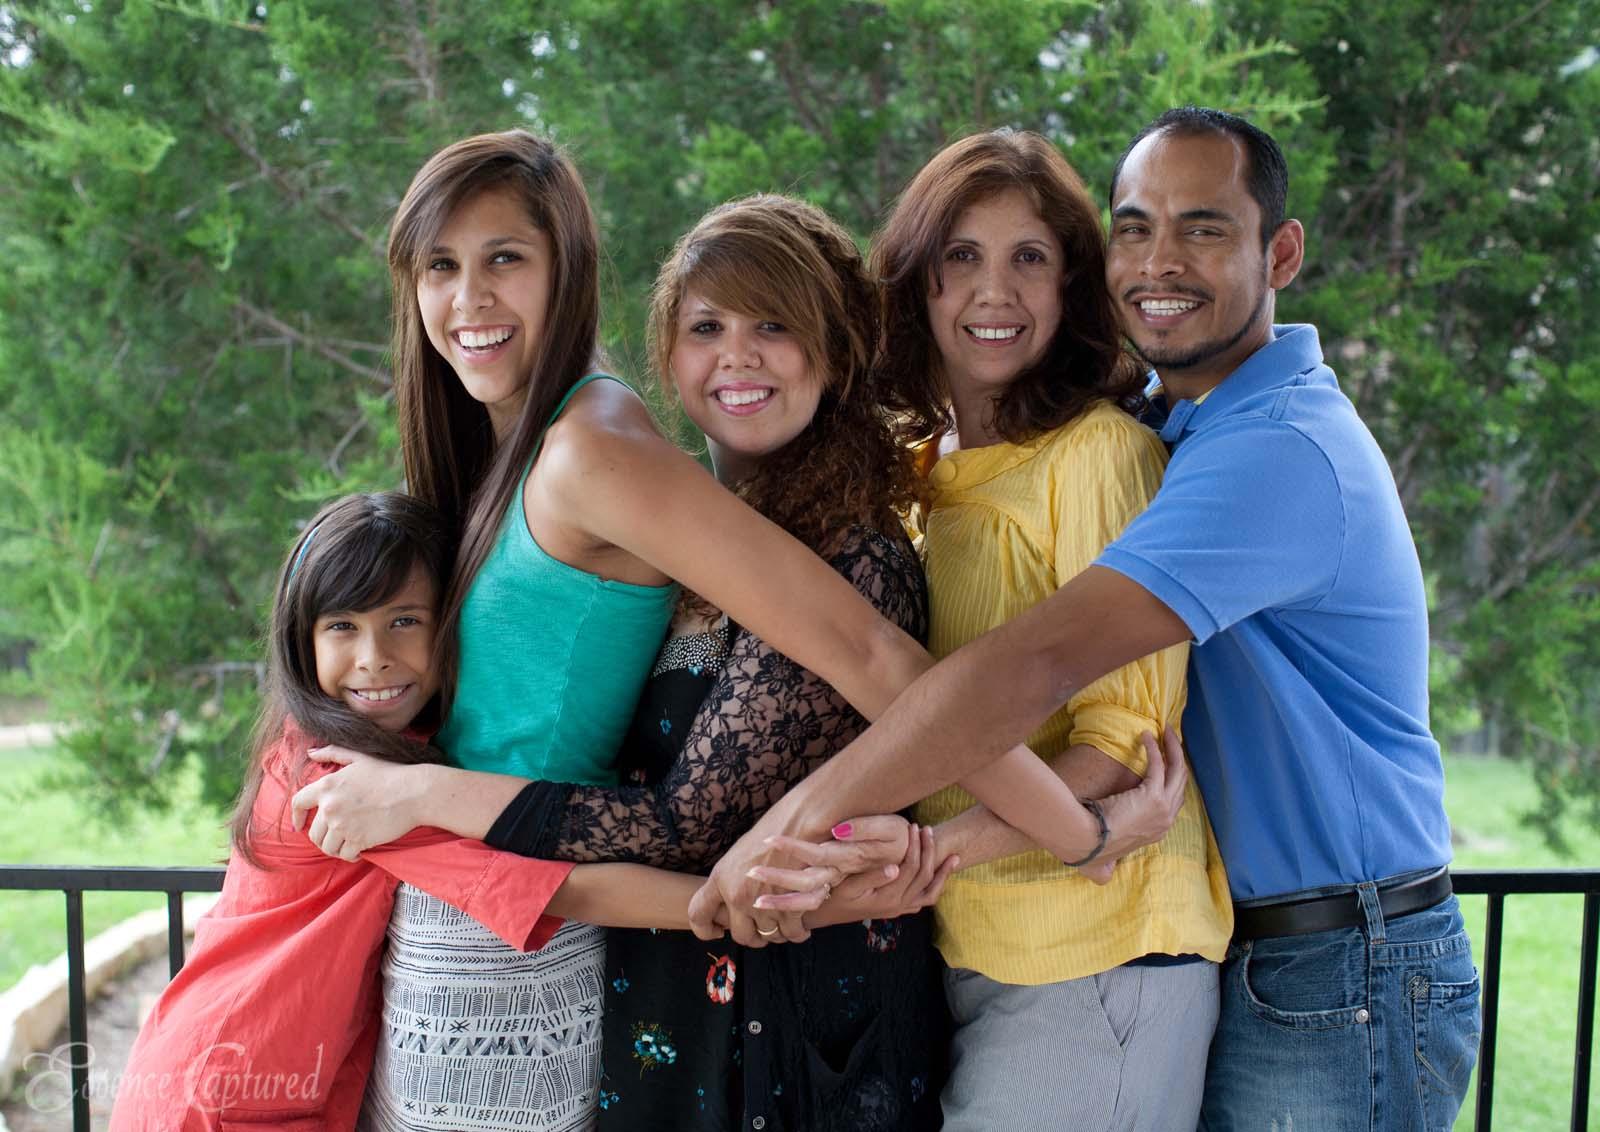 family of 5 hugging in back yard